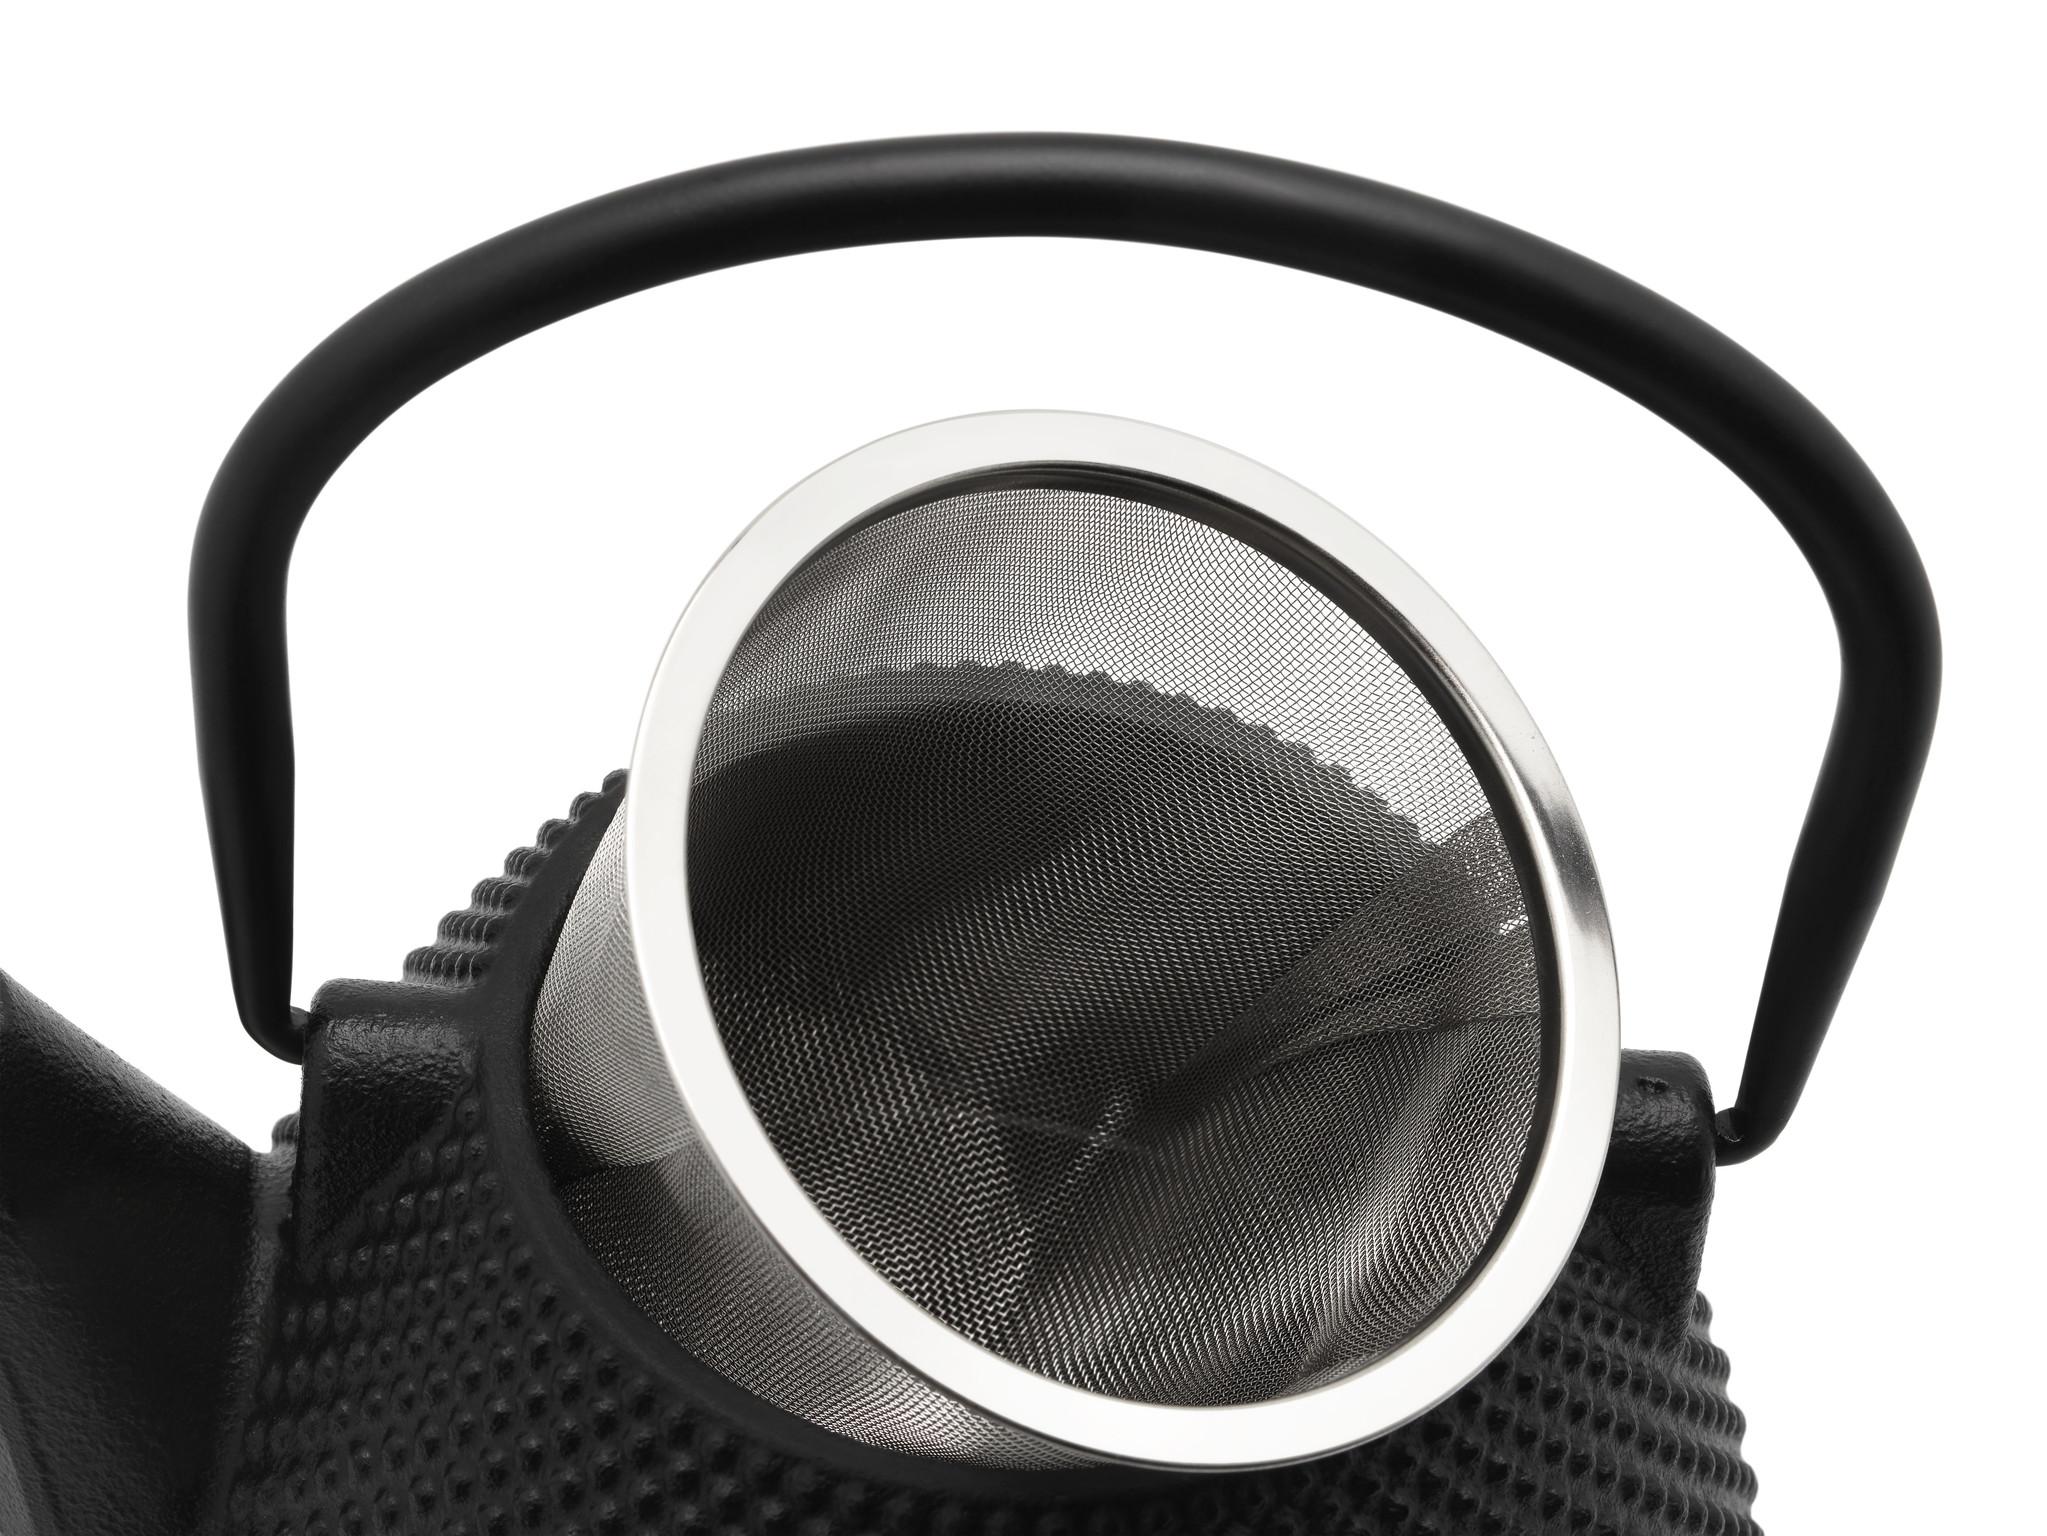 Bredemeijer Theepot Wuhan 1.0 L gietijzer zwart